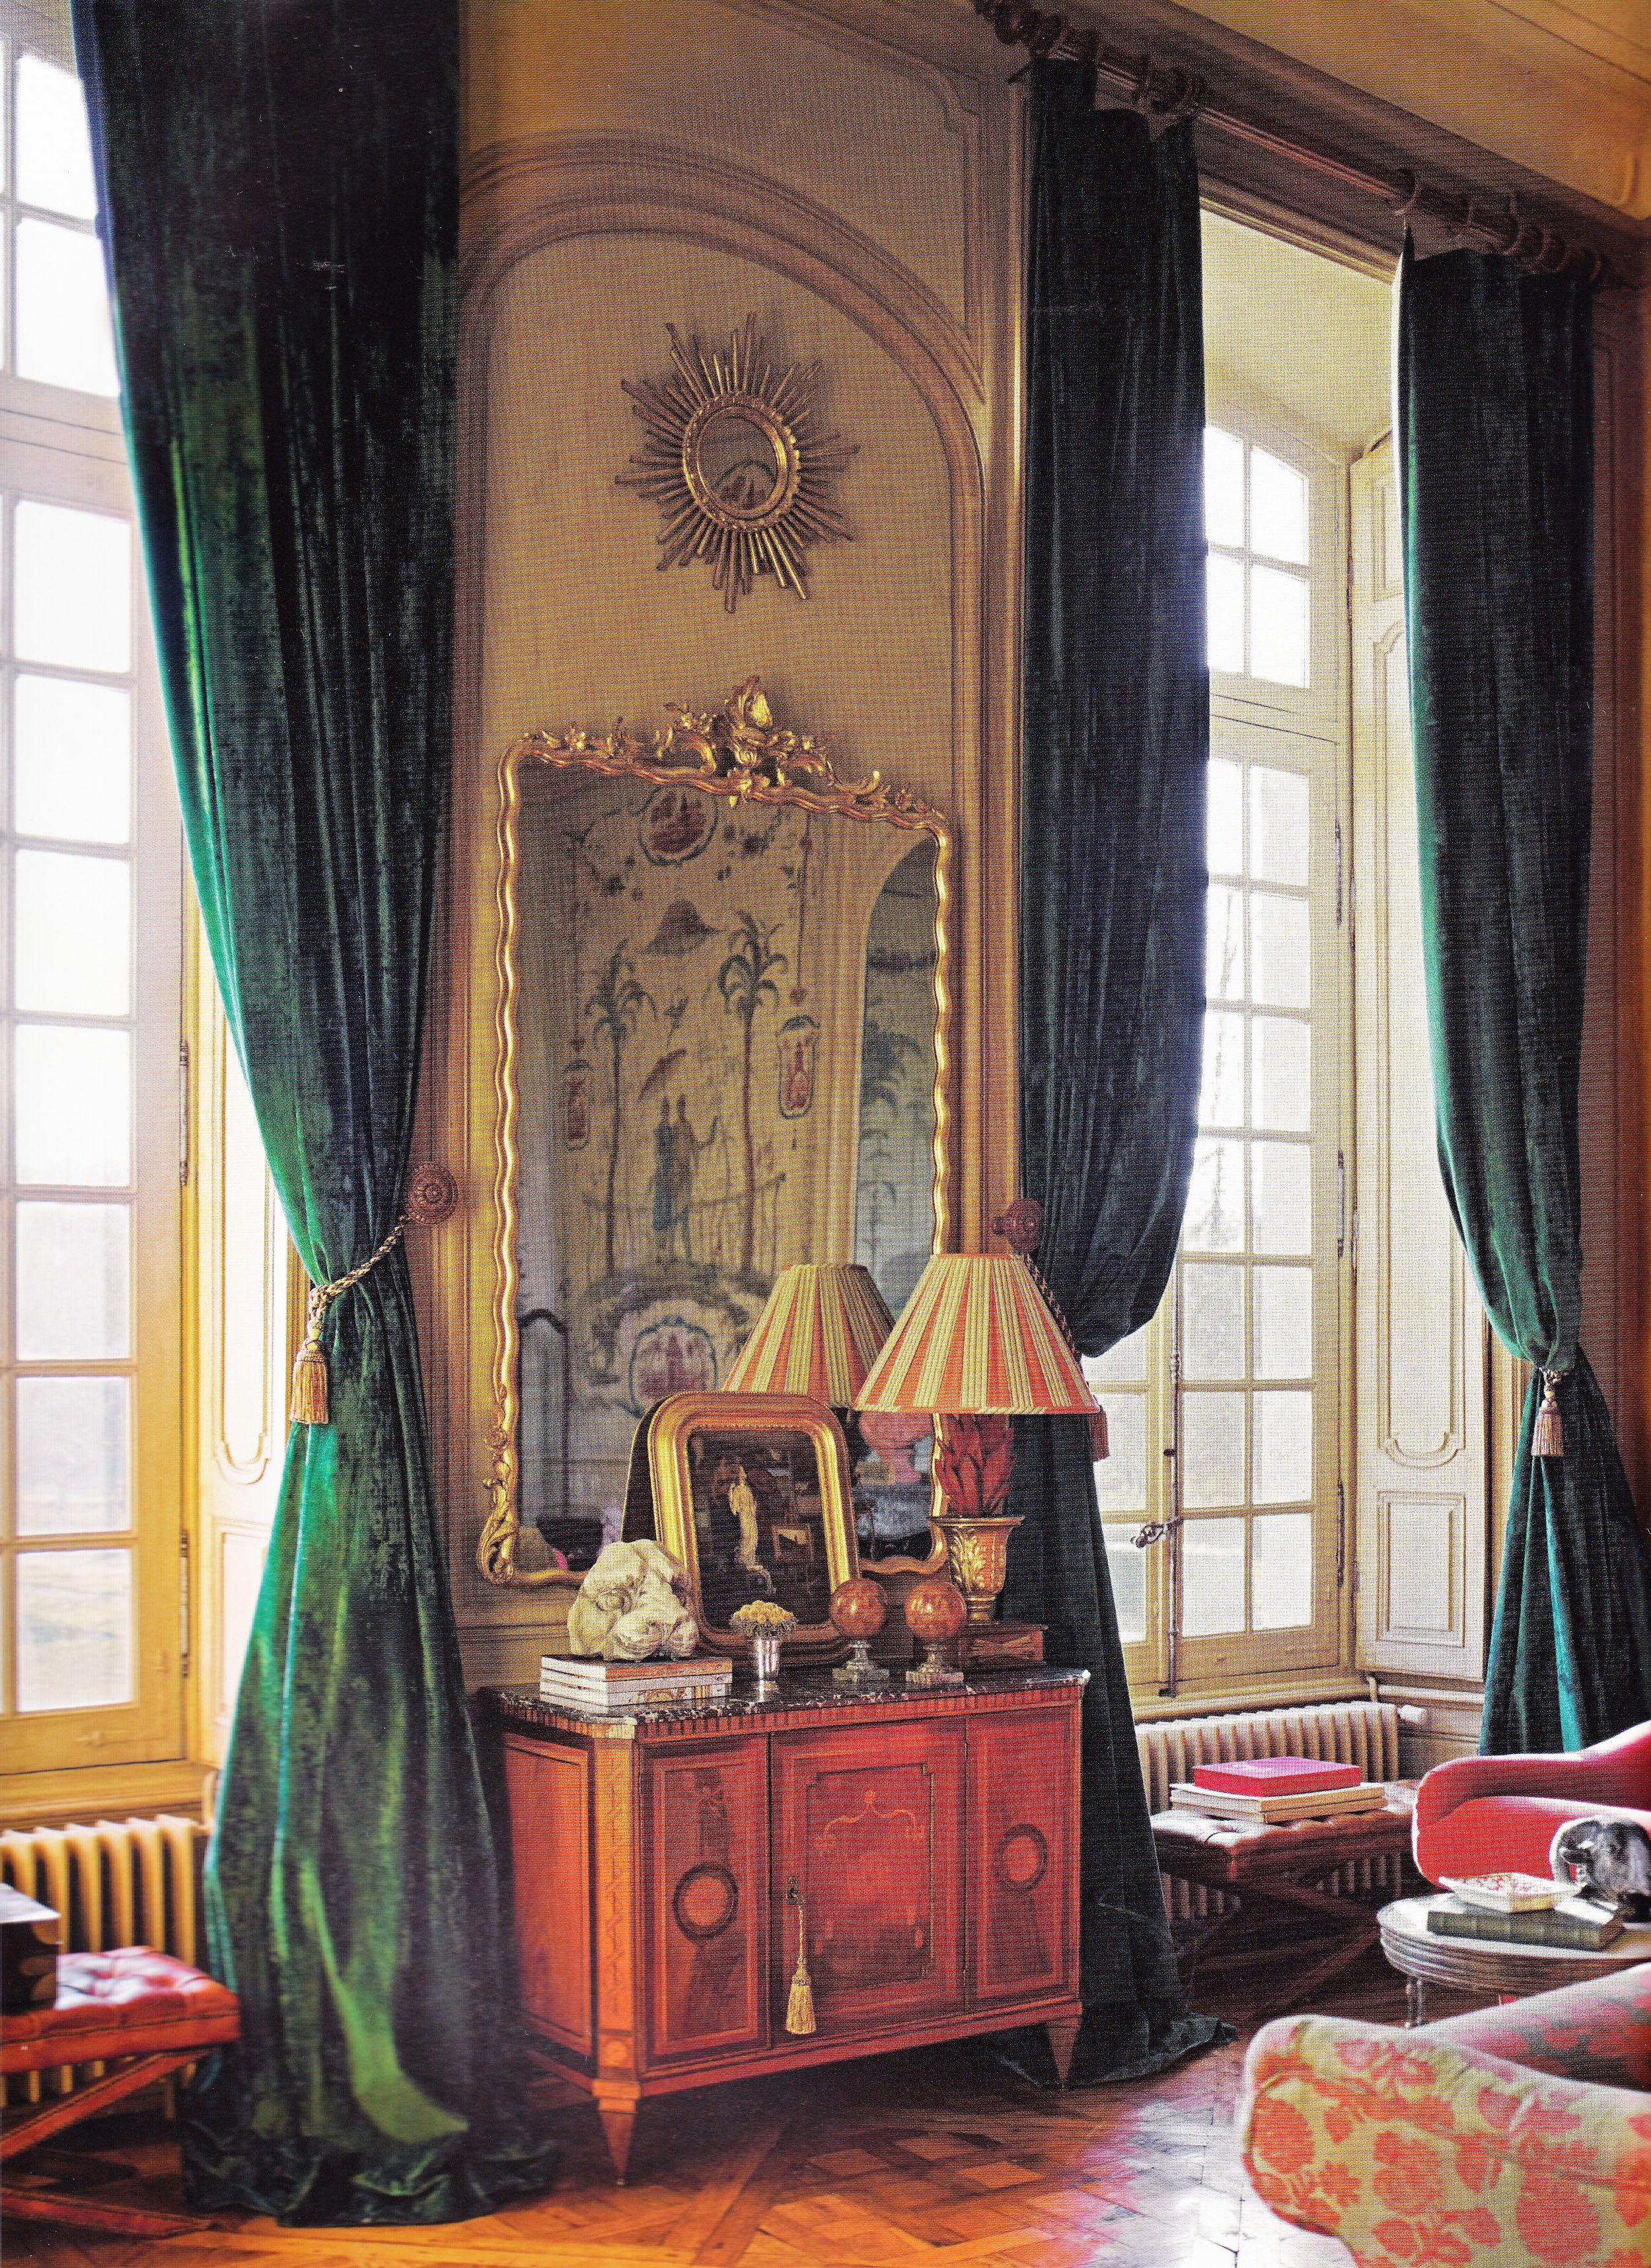 Decorator Timothy Corrigan S Restored Chateau Du Grand Luce Chinois Salon Features Panels By John Bapti Room Interior Design Interior Design Photos Interior